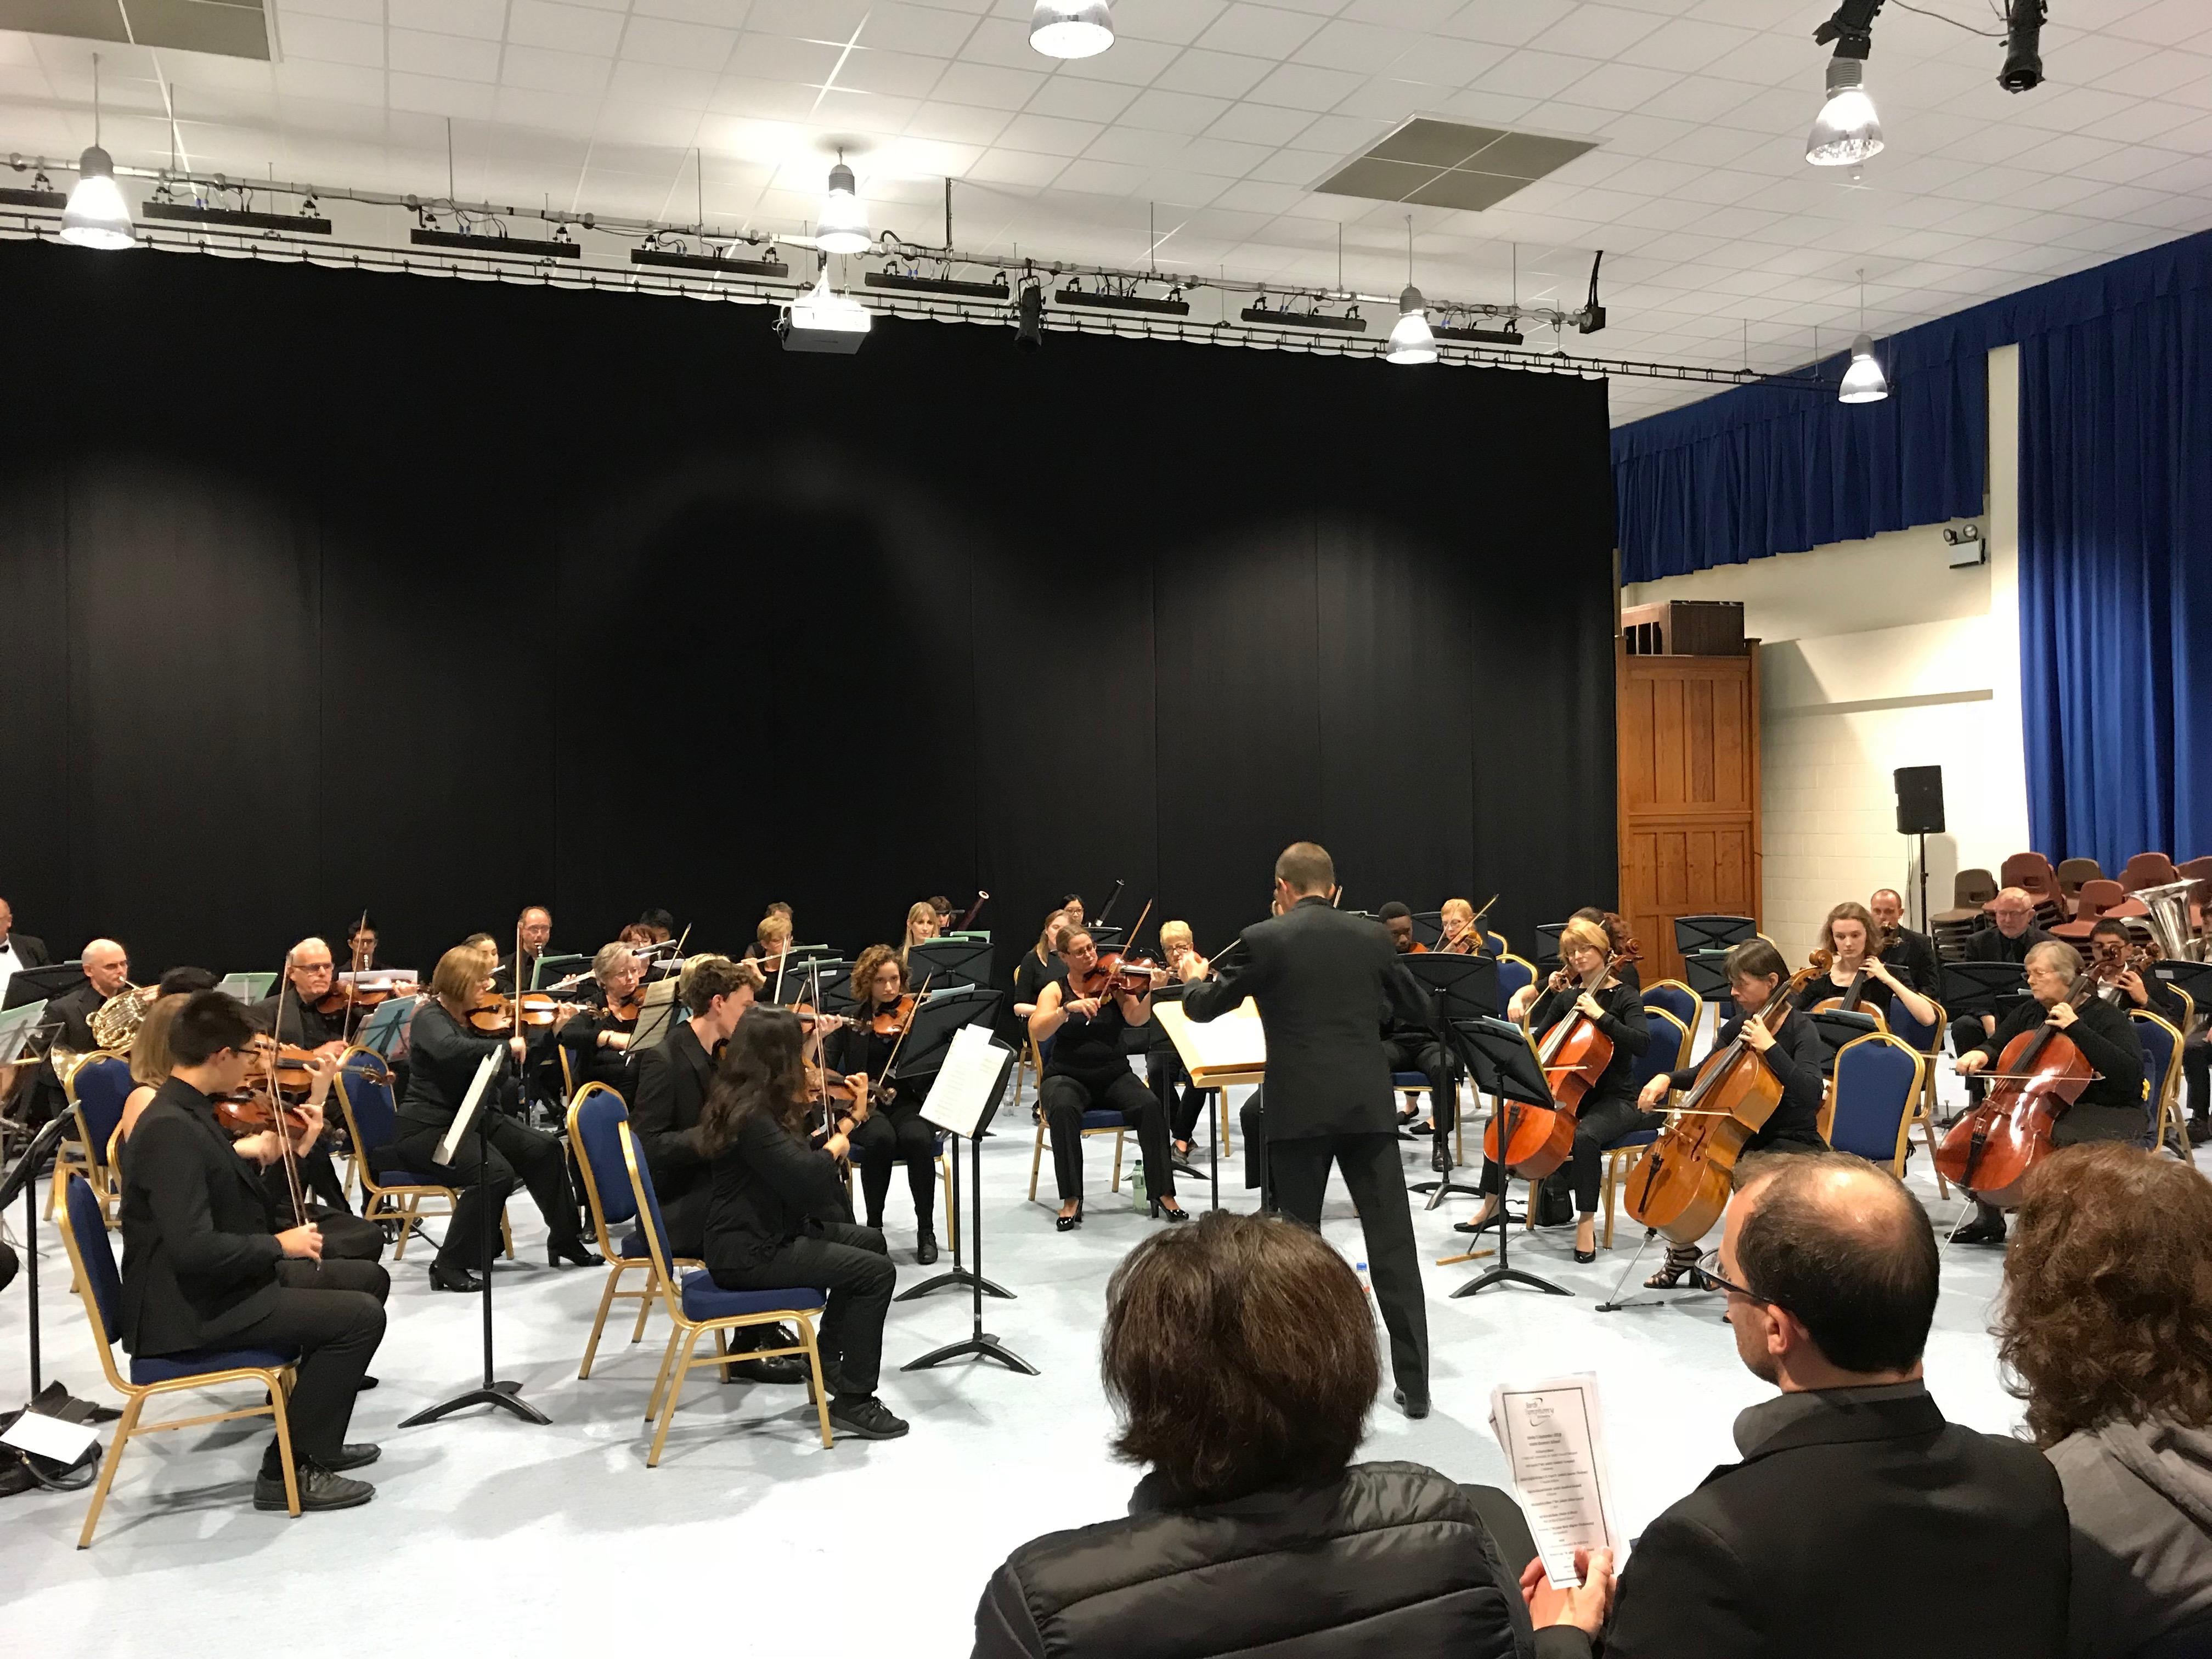 Bardi concert at Leicester Grammar School